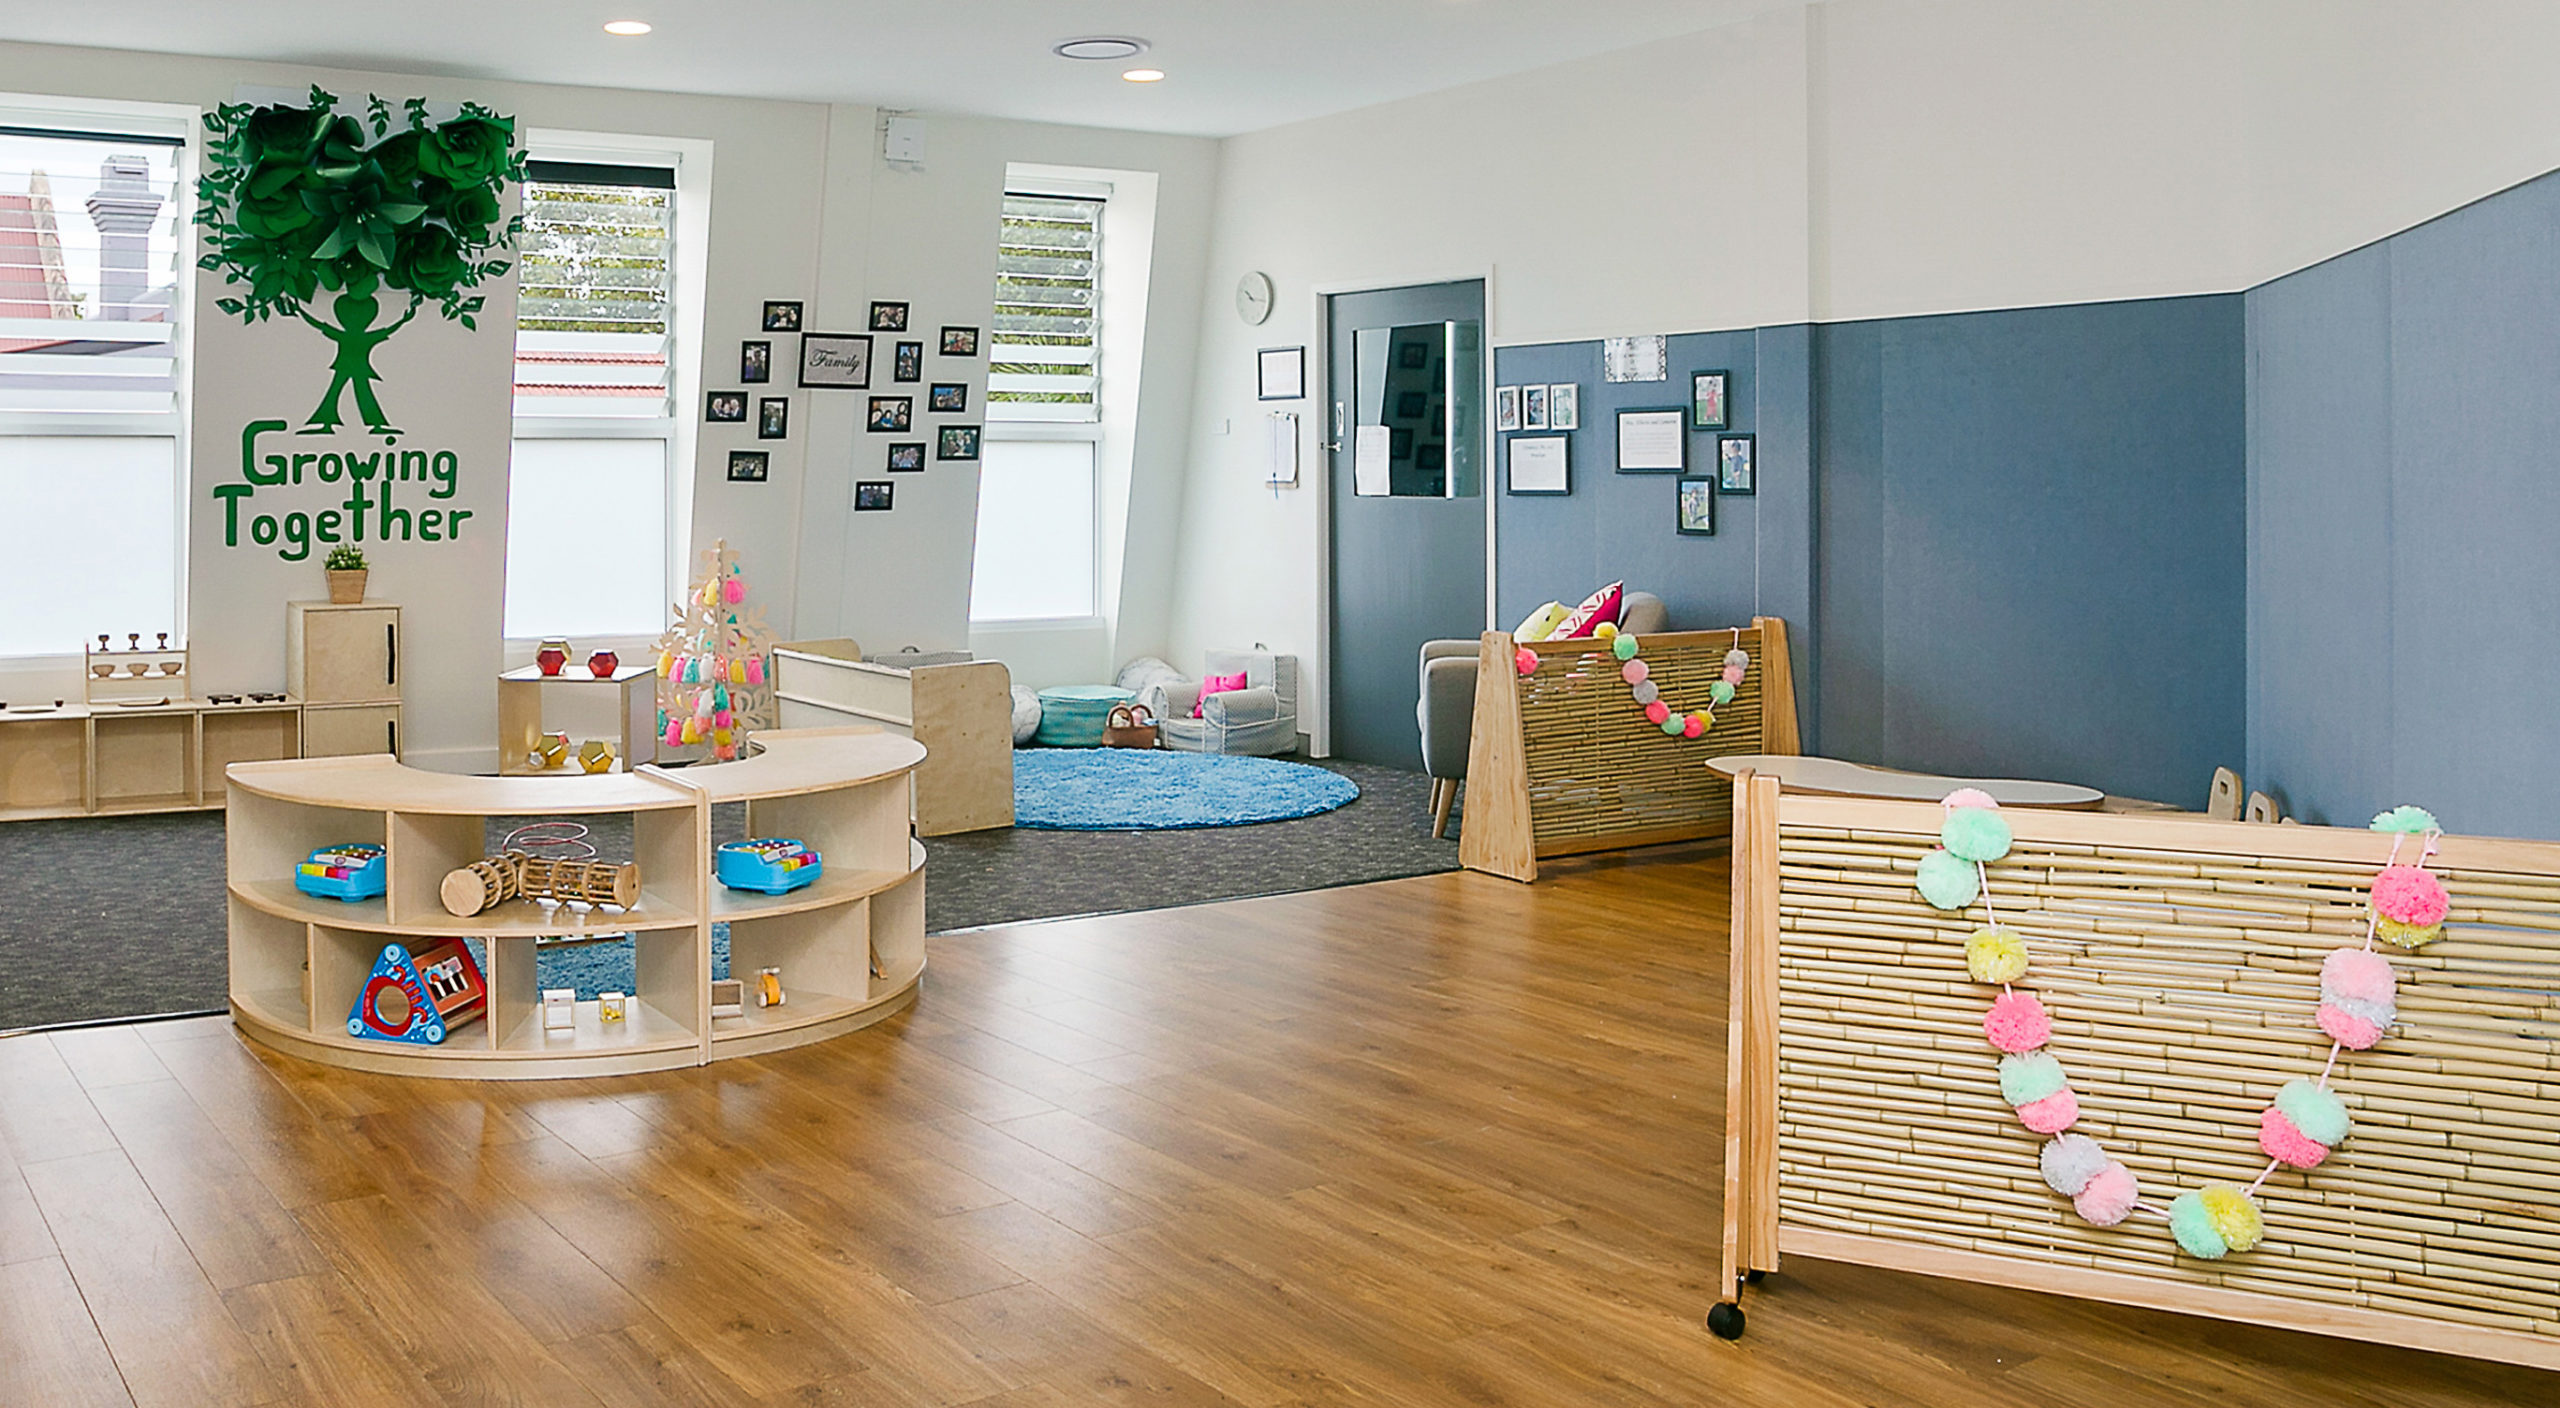 Only About Children Childcare Surry Hills Play Area Interior Design- Gardner Wetherill GW 02